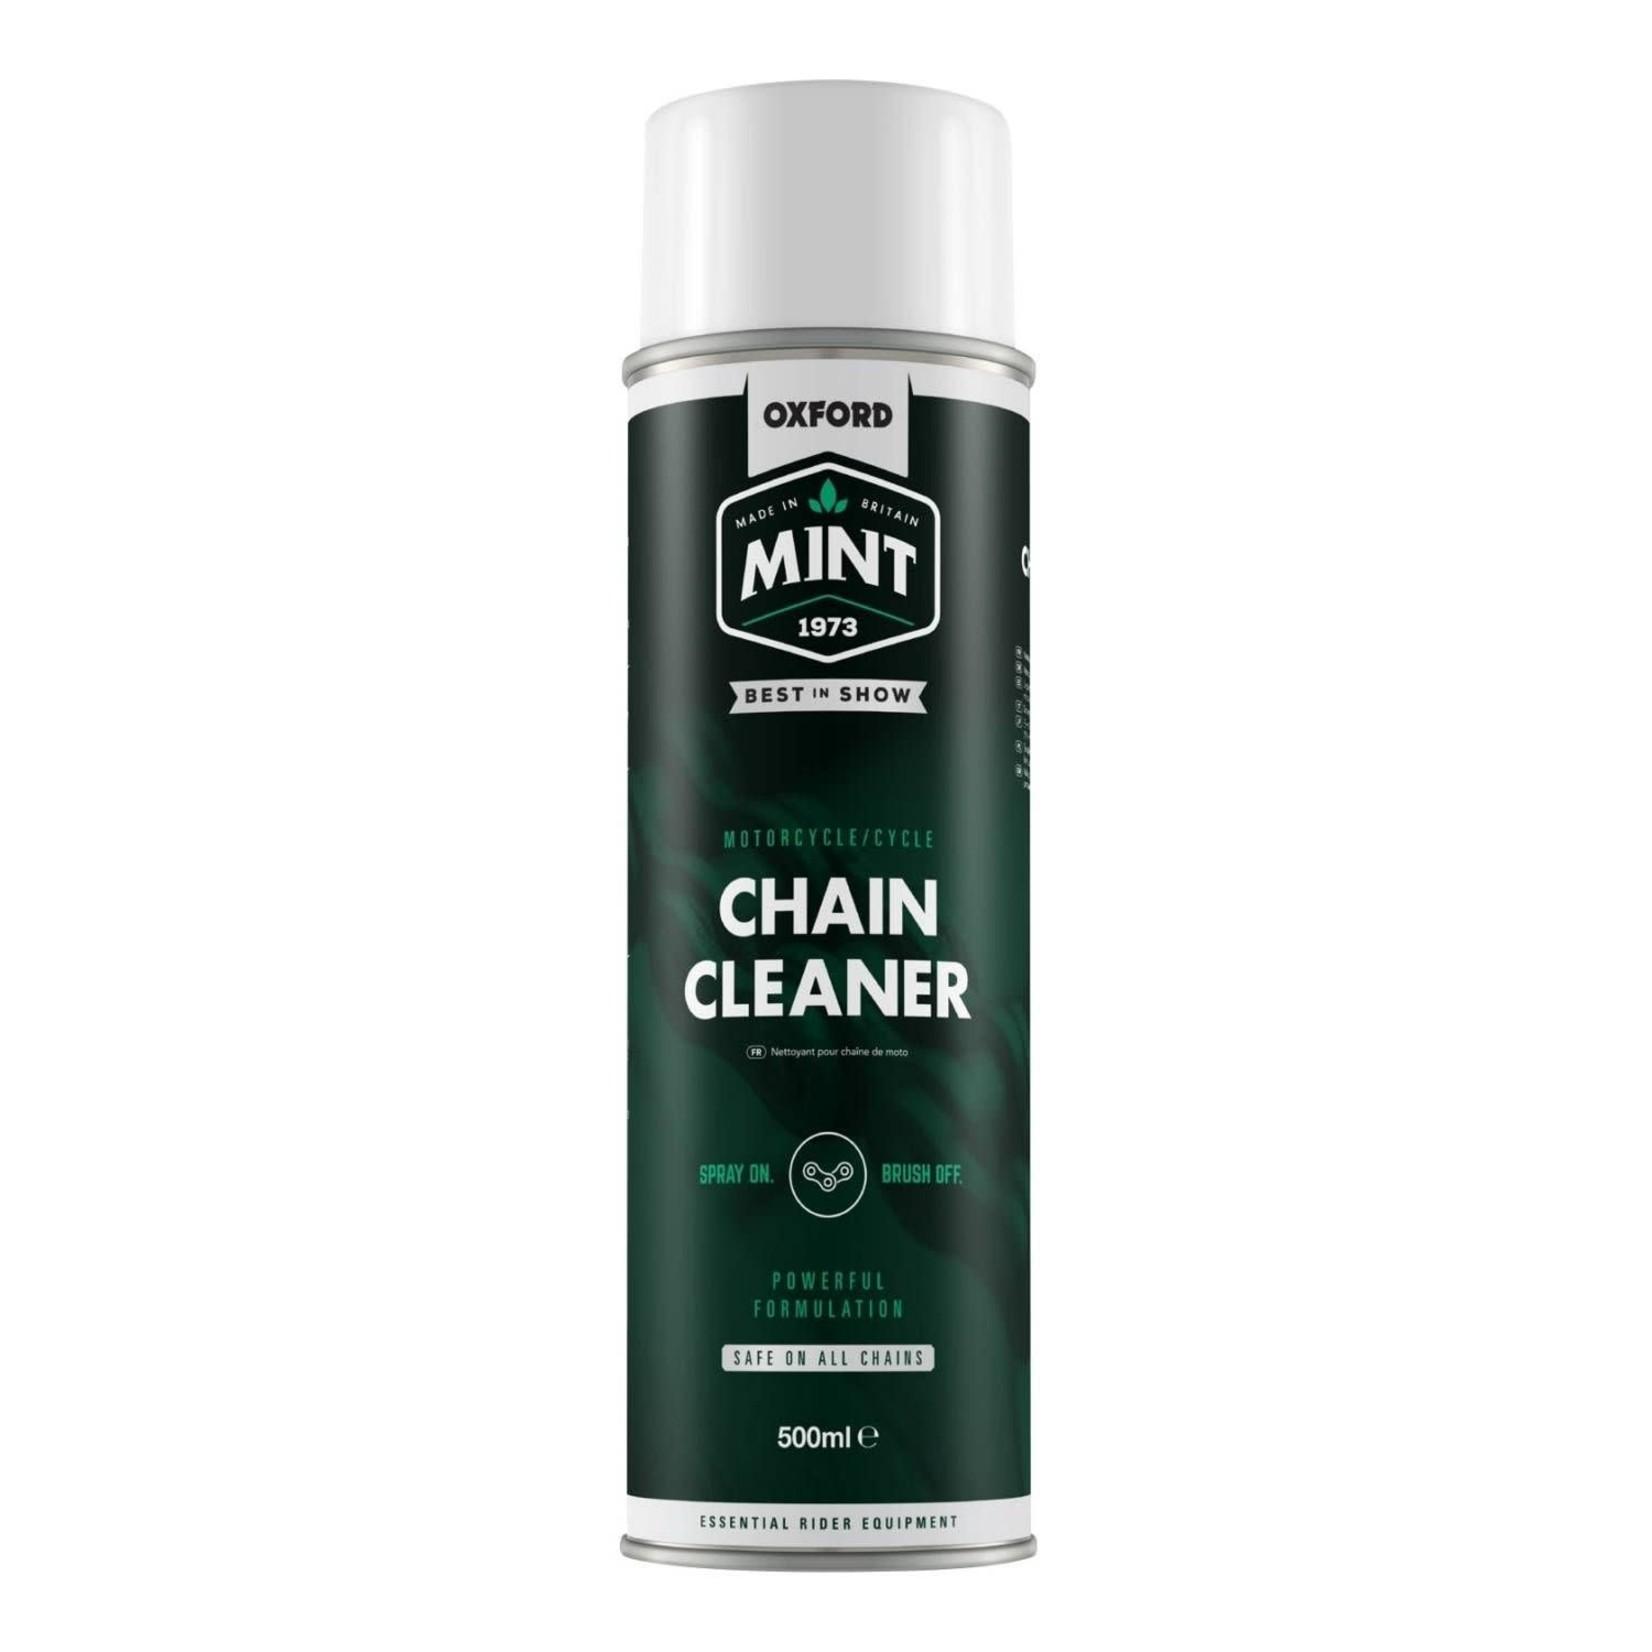 MINT Chain Cleaner 500ml